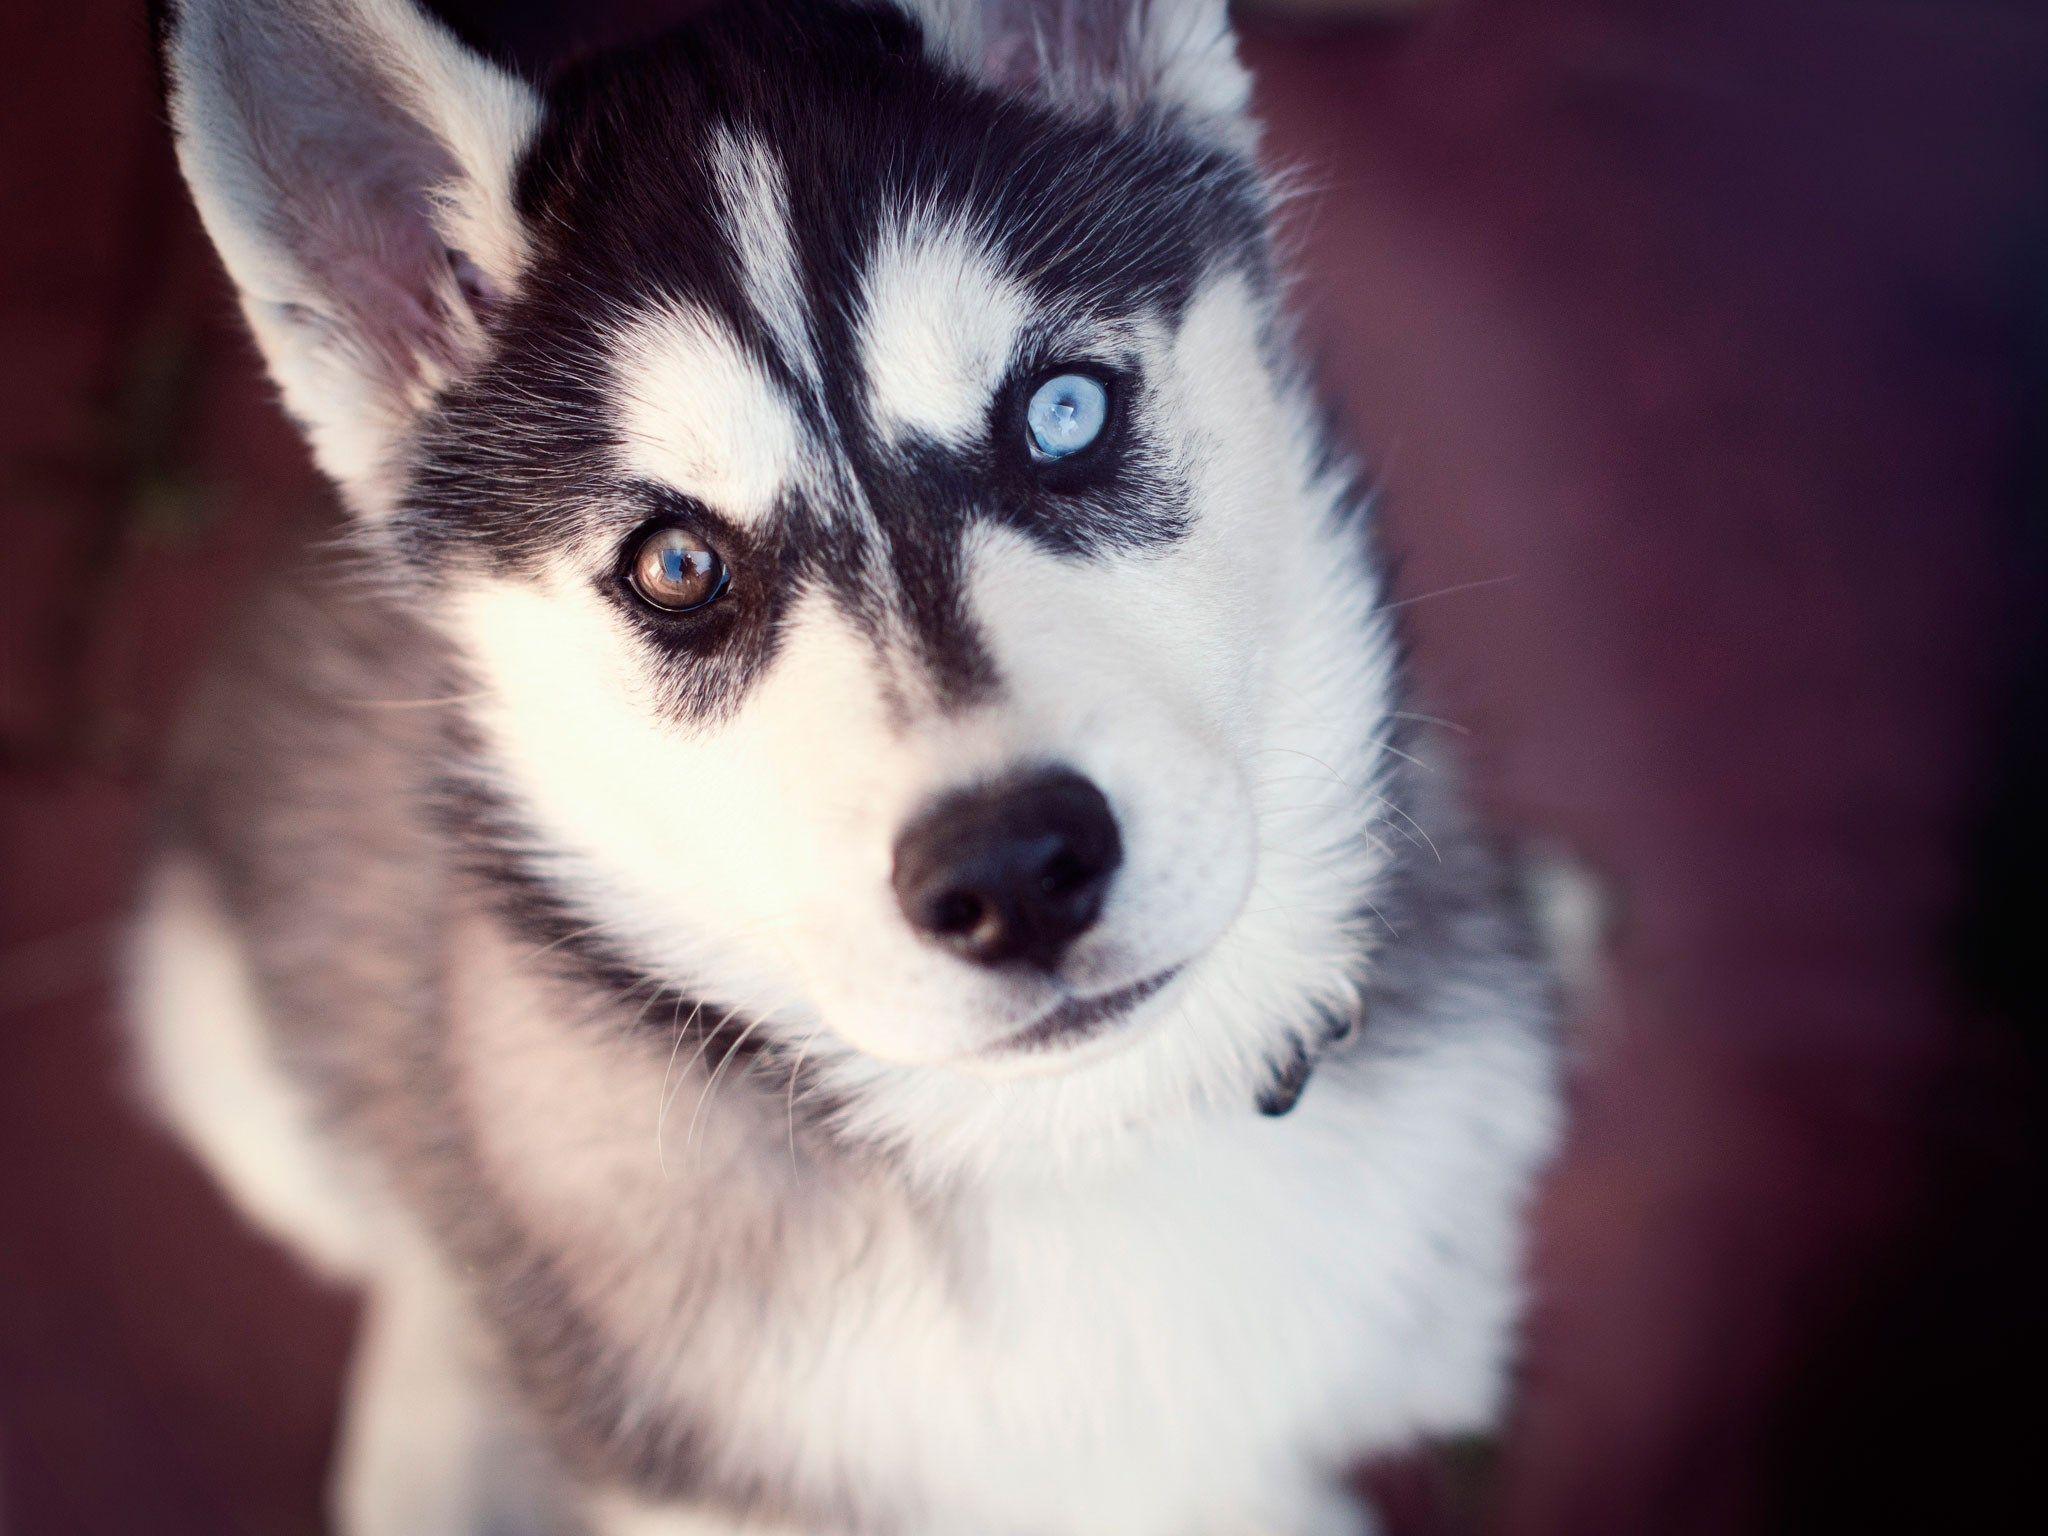 Husky Wallpaper Desktop Backgrounds Cute Husky Puppies Husky With Blue Eyes Husky Puppy